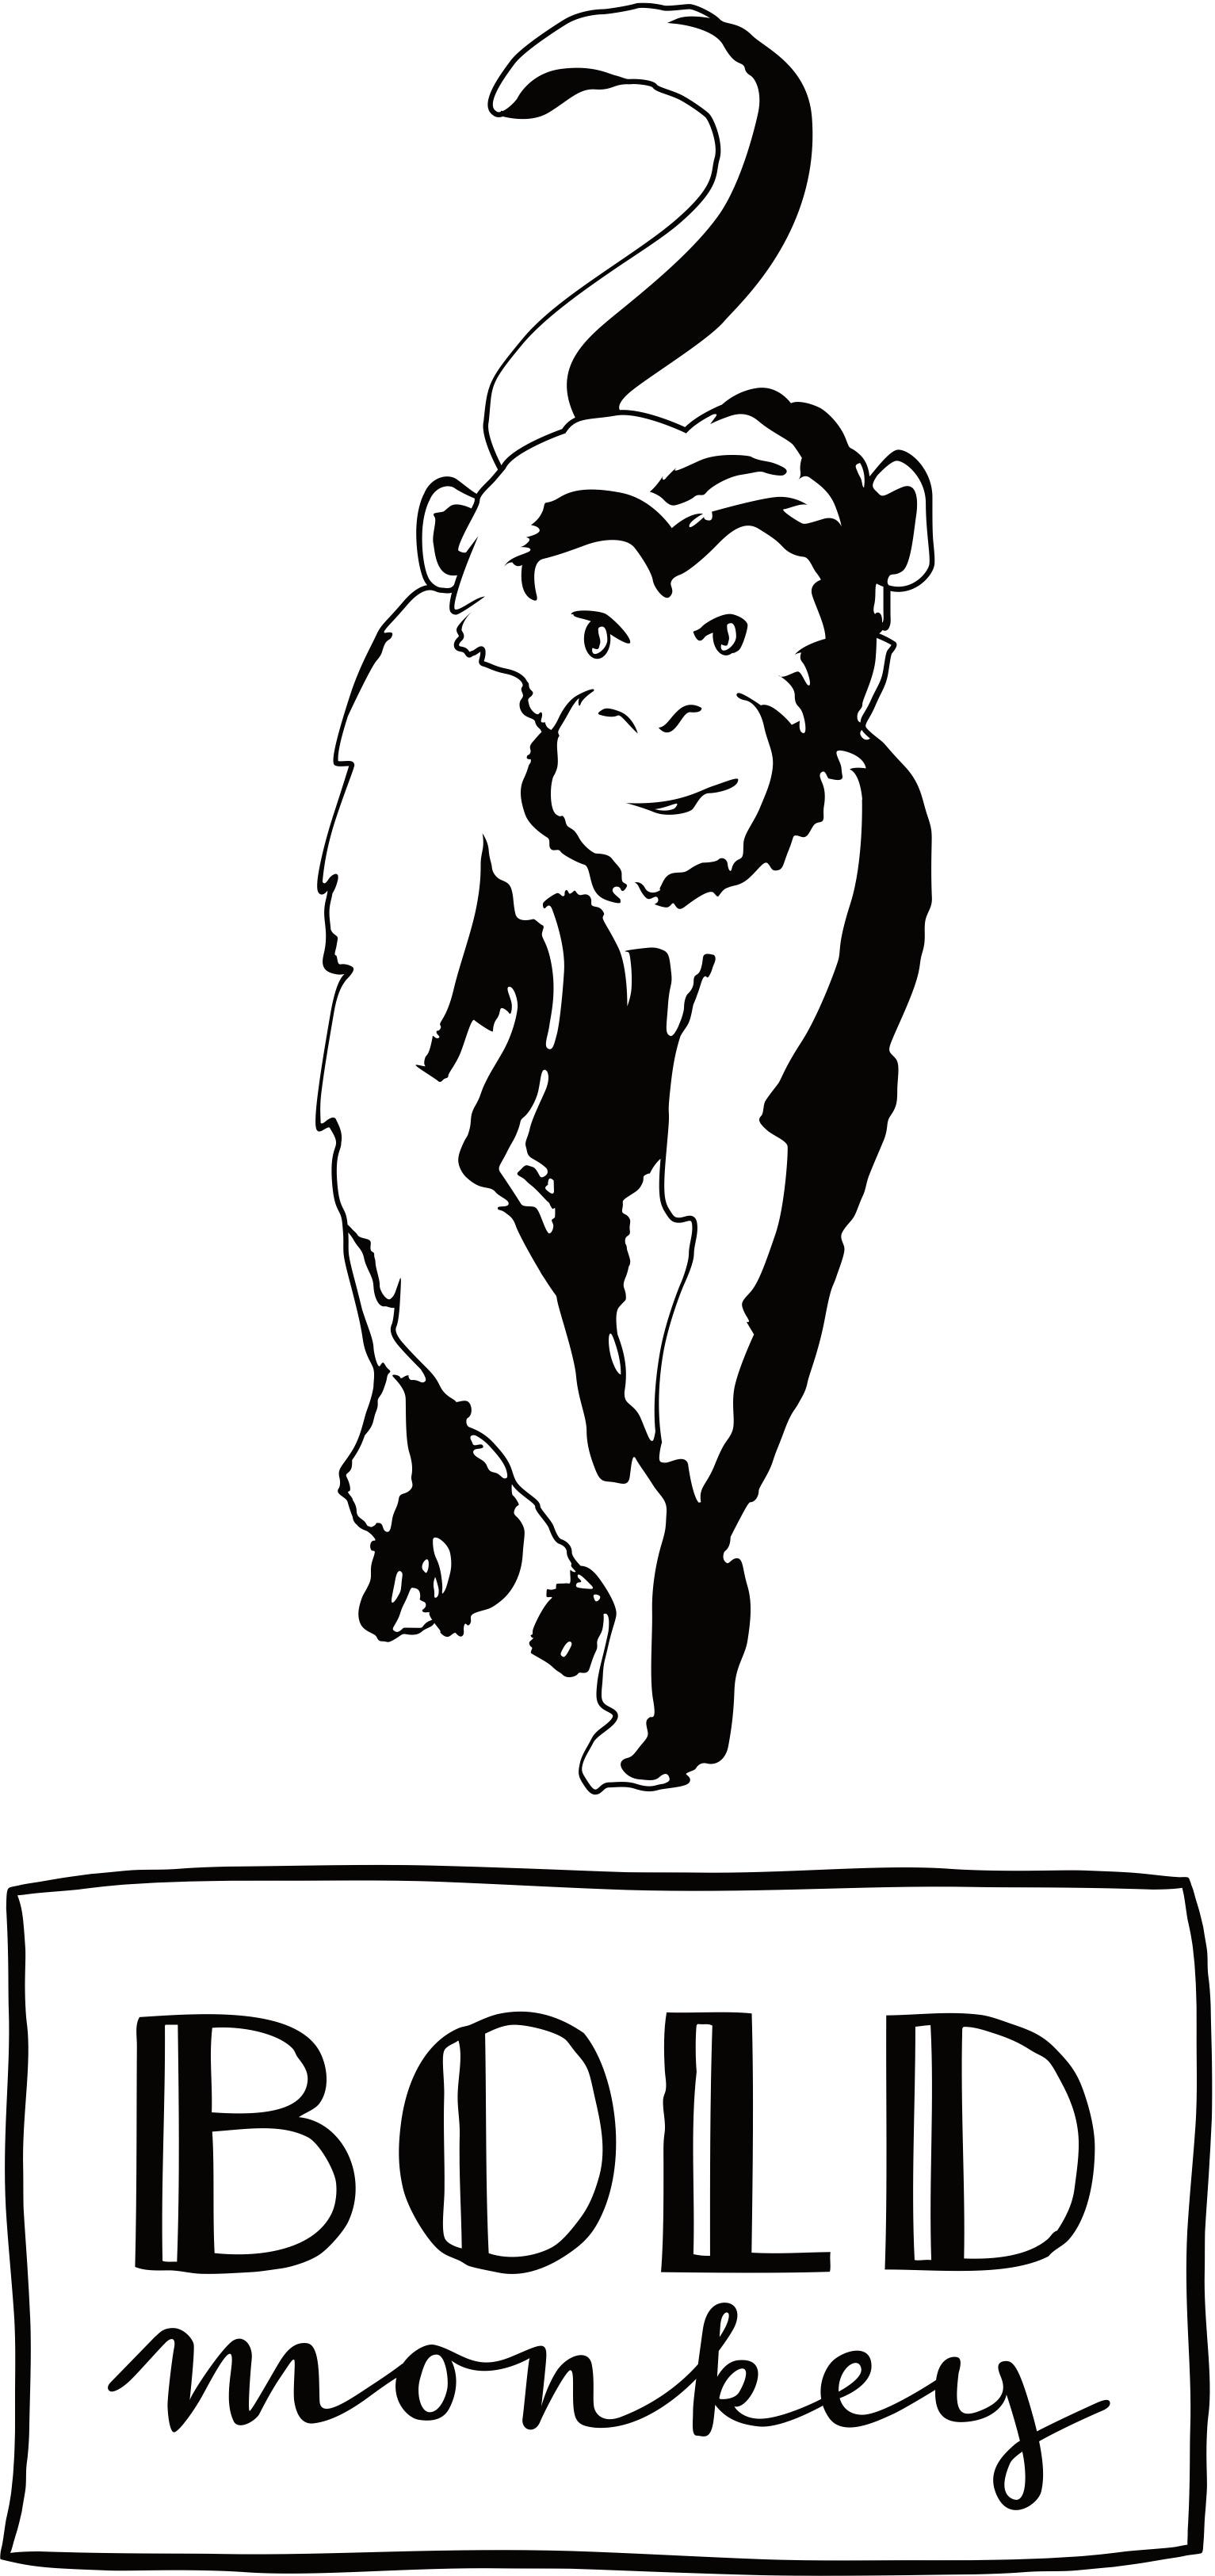 bold monkey Swinging Lines vloerkleed 200x300 zwart